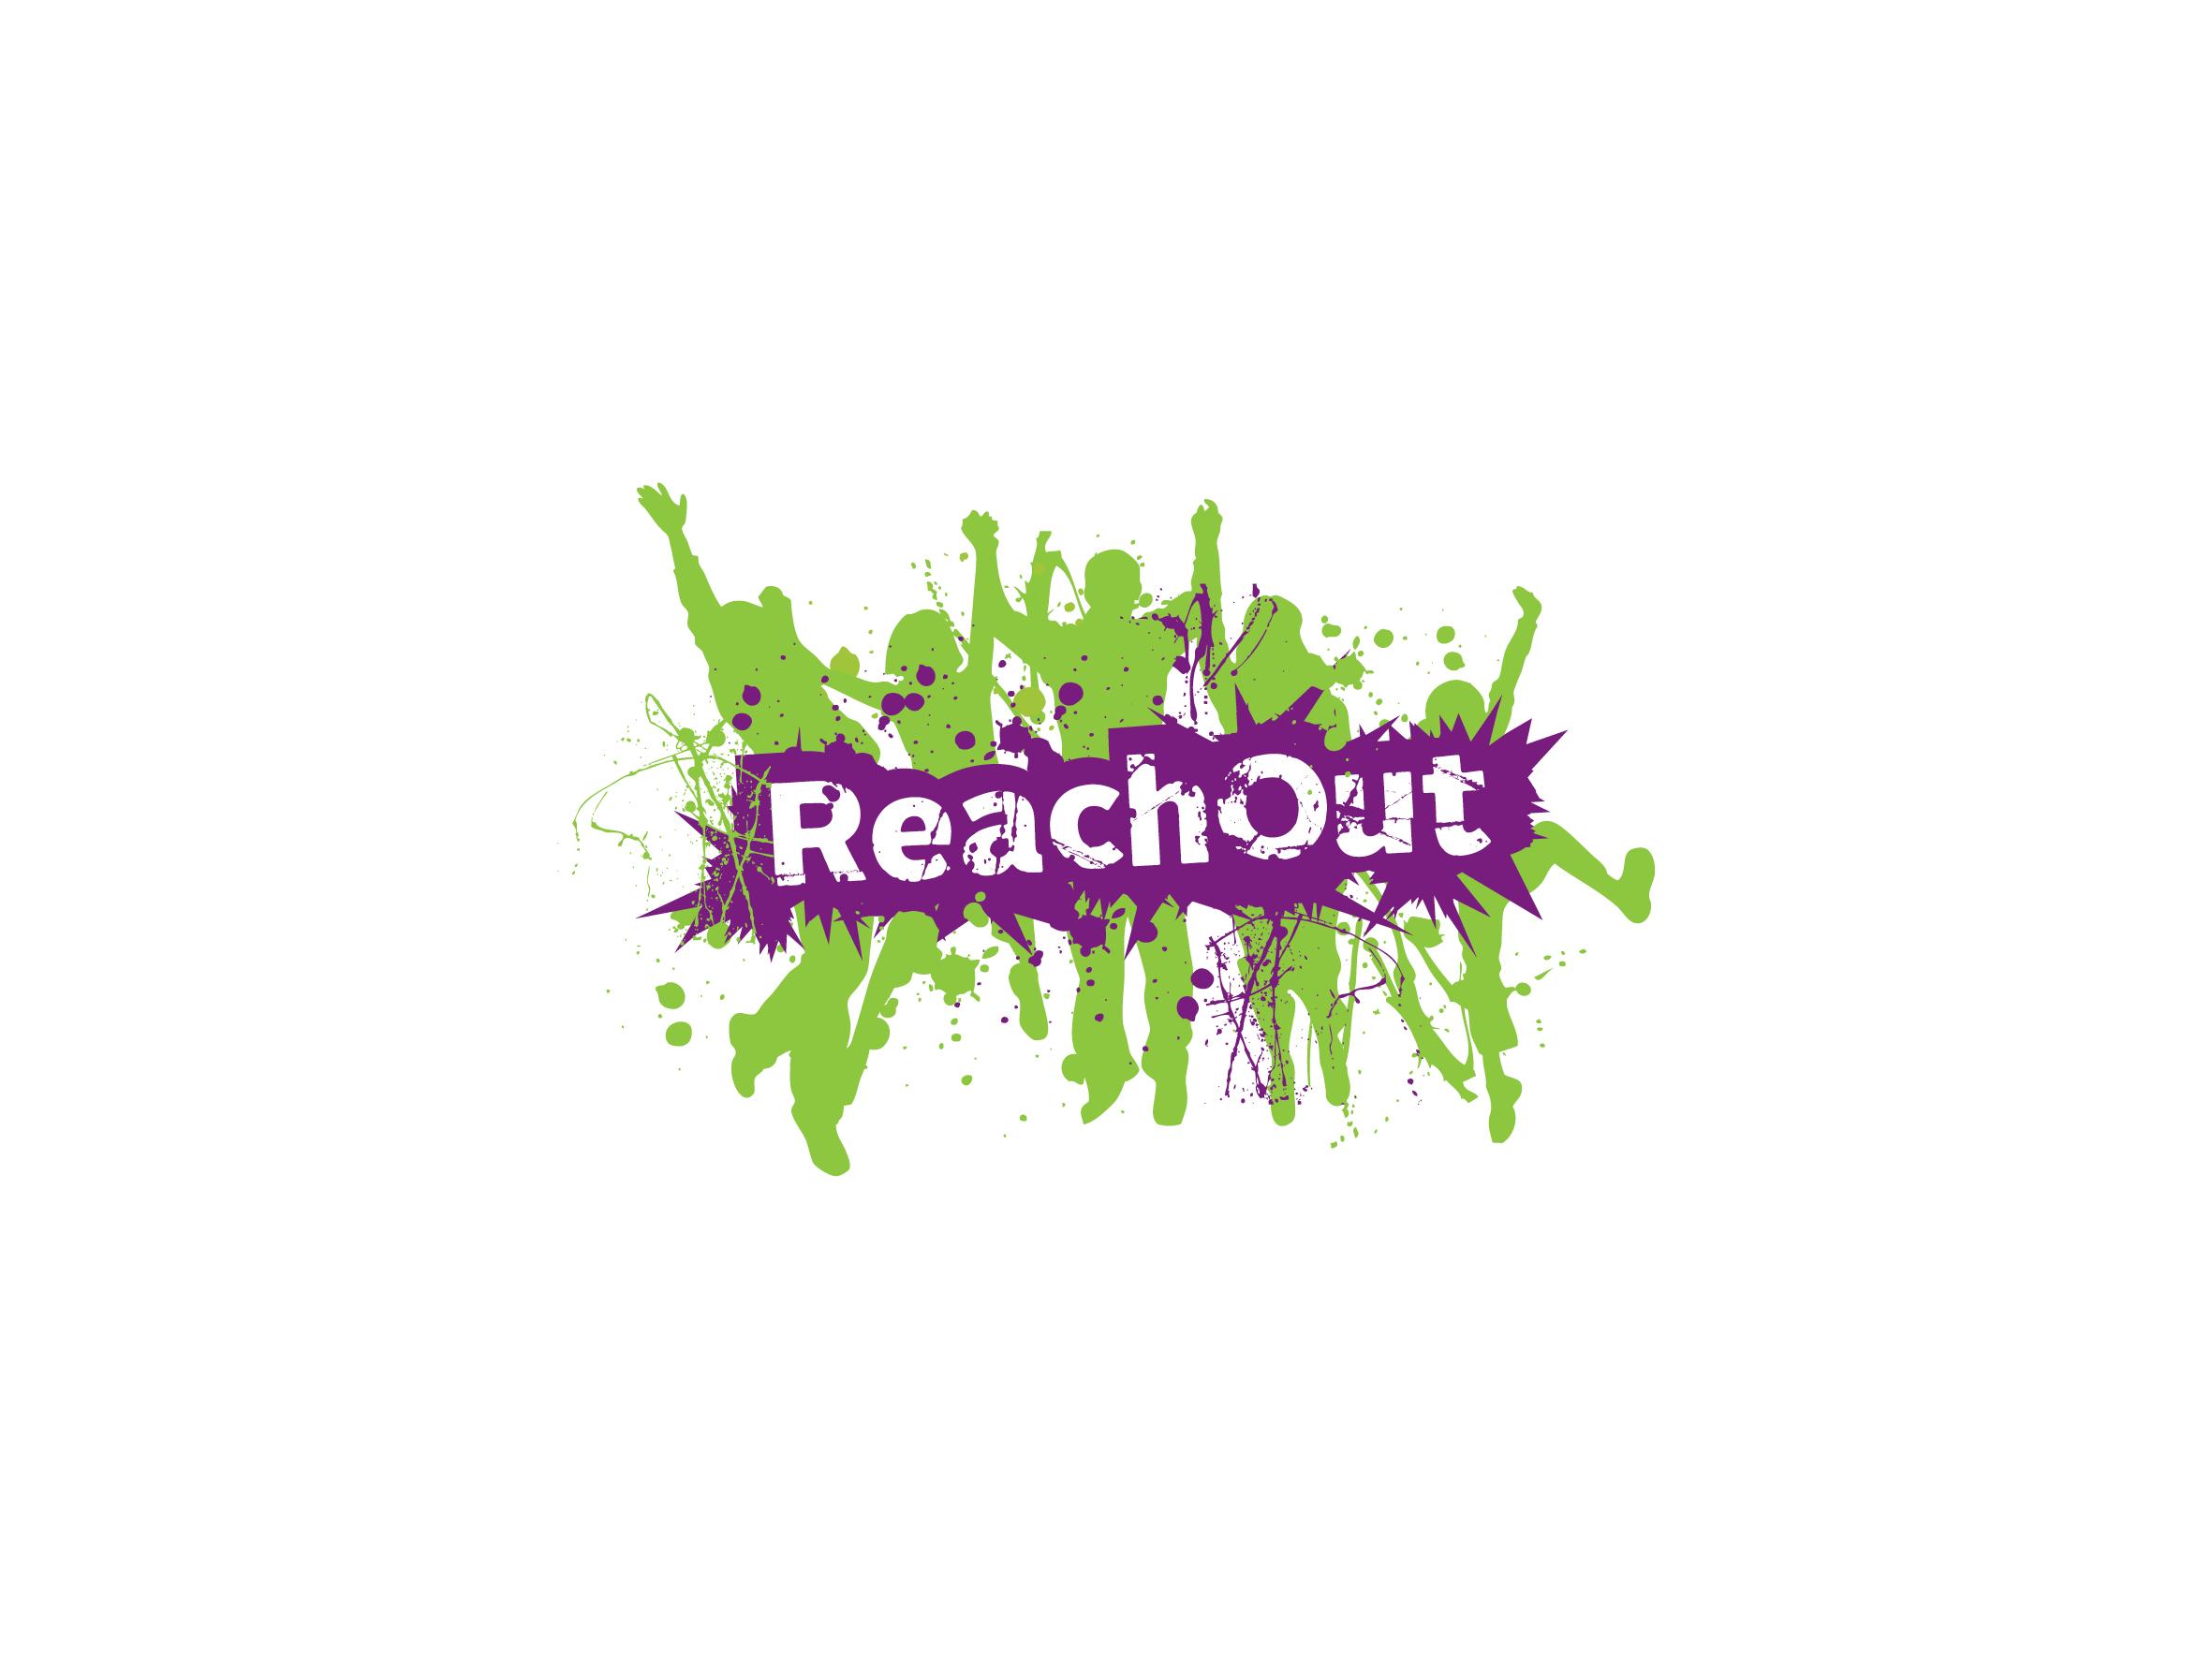 reach out rotherham barnardo's logo design designed by Dakini Design Saltaire, Shipley, Bradford